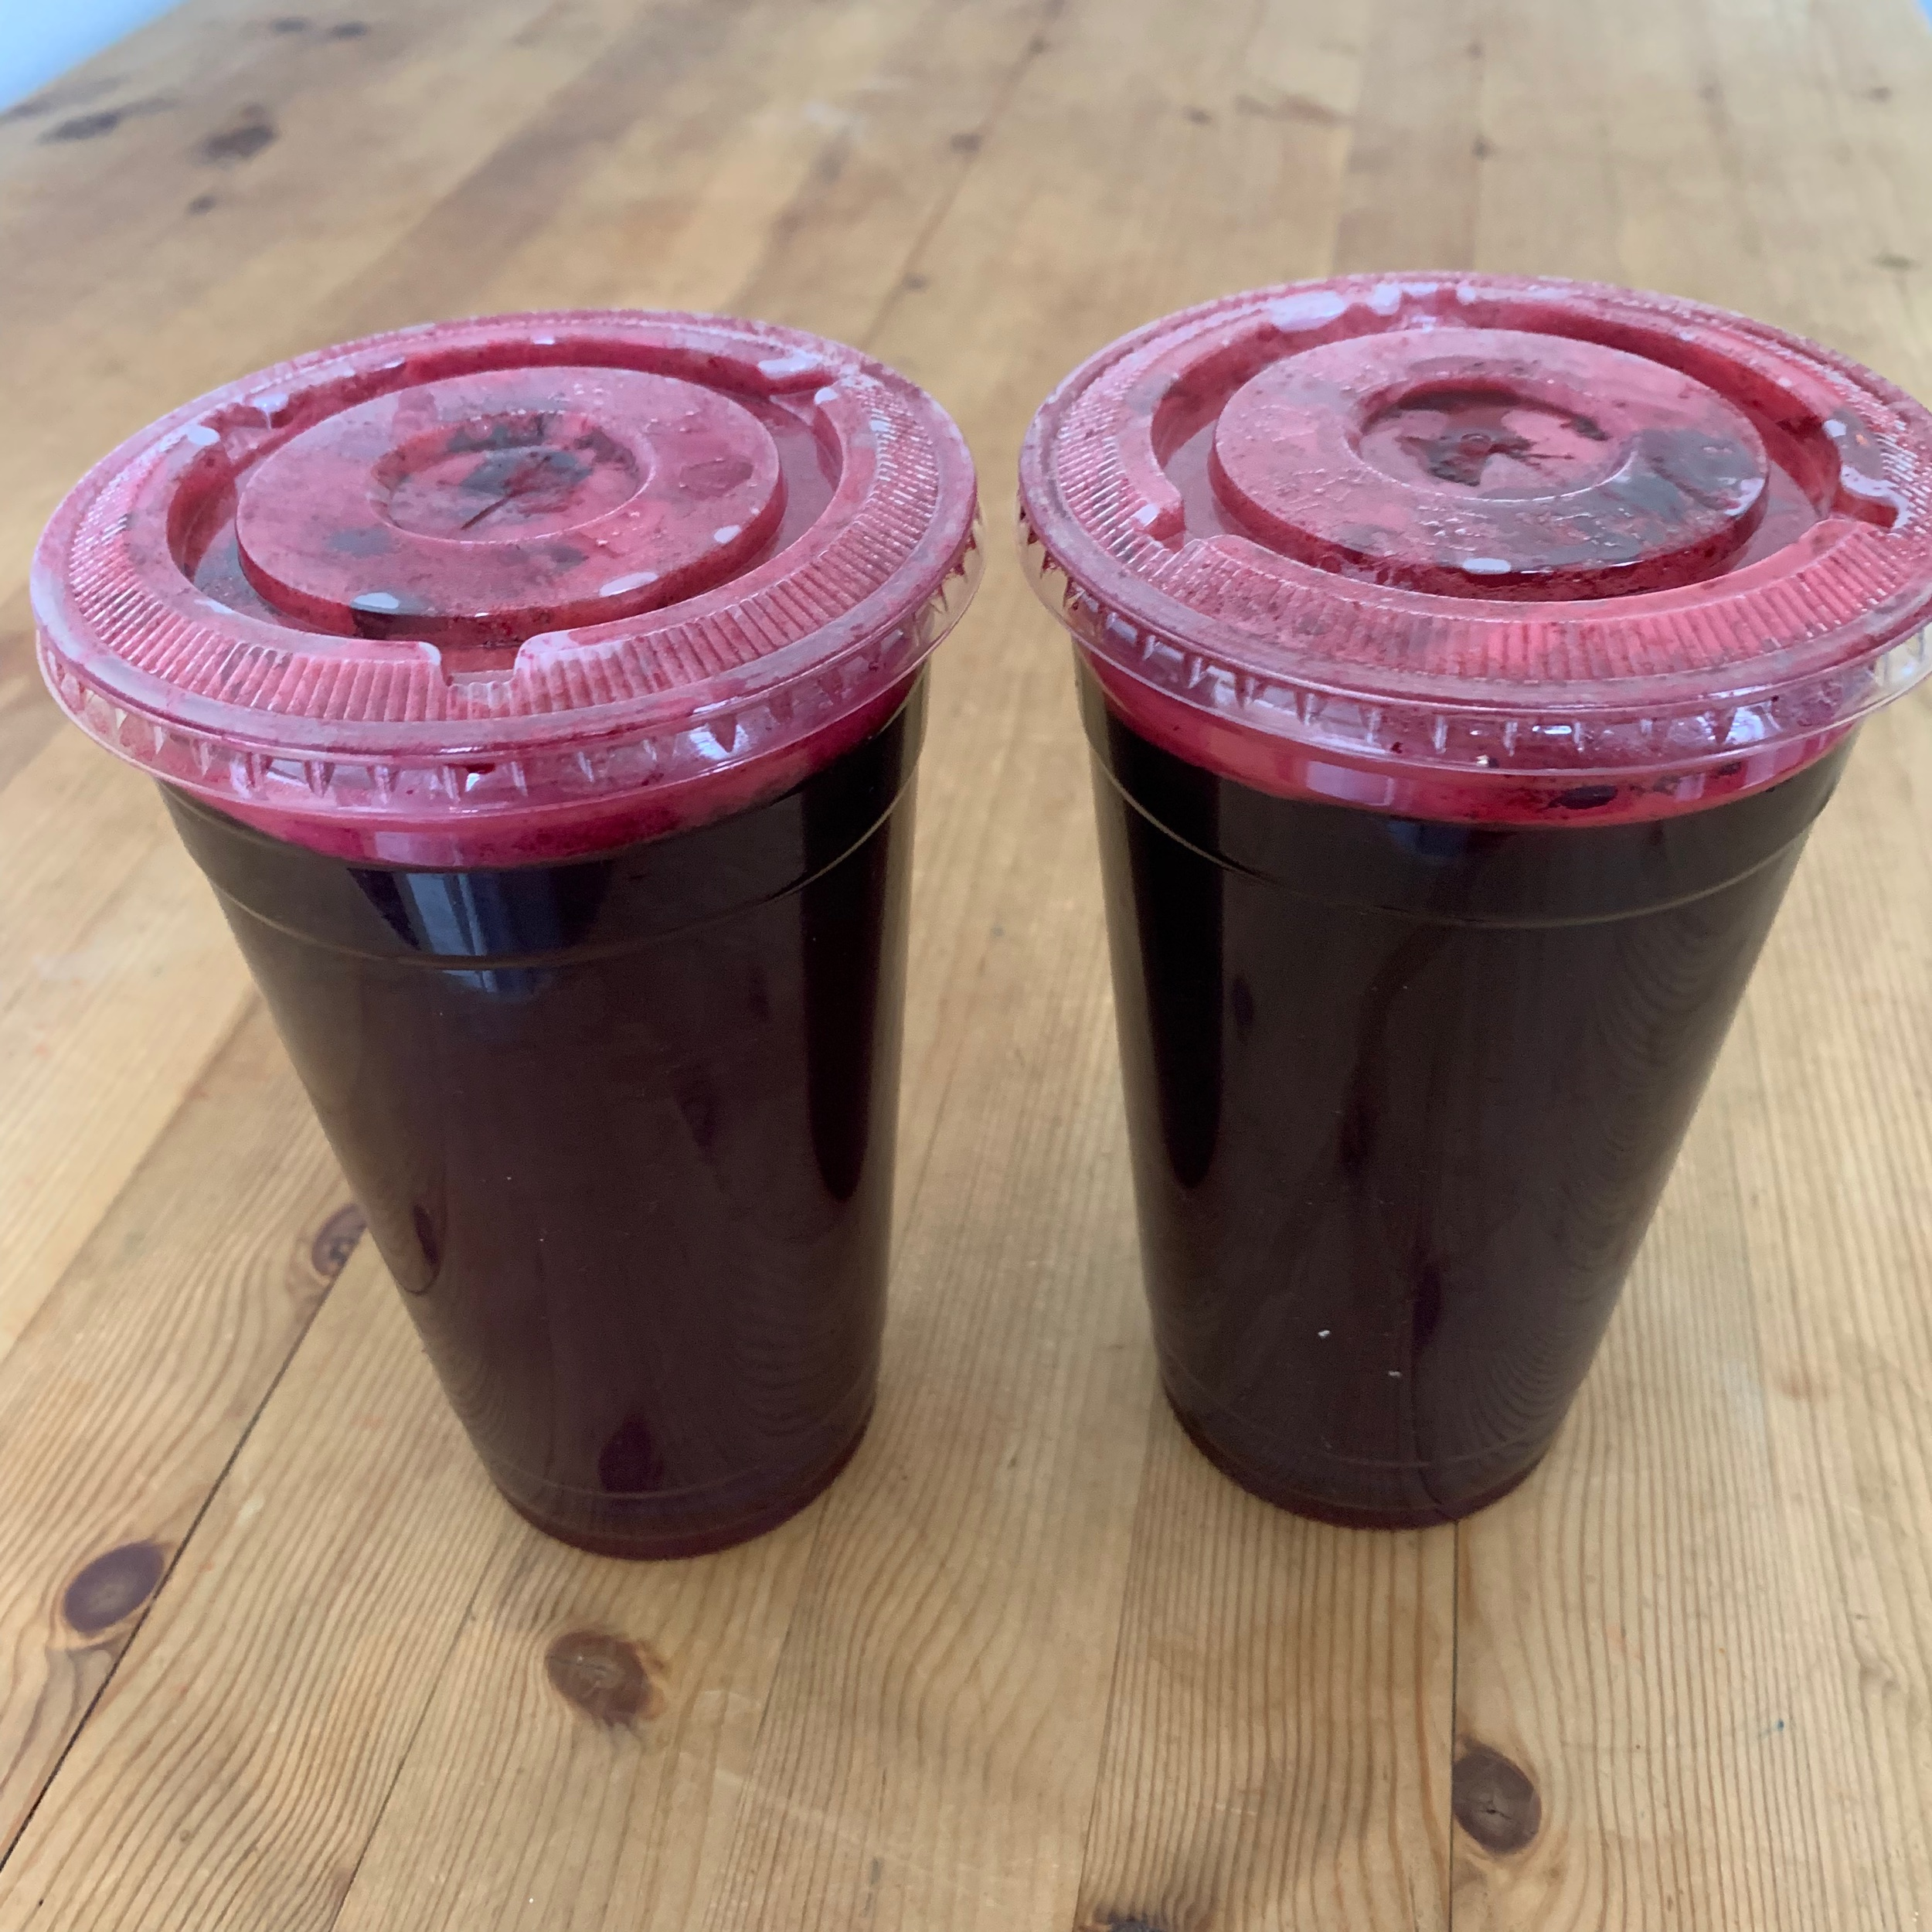 Sometimes, a friend of mine delivers to me freshly squeezed beets juice from JacksonHts. Thank you, Romina :)  息子の学校クラスメイトだった子のお母さんが、私の病気を気遣って、たまに搾りたてビーツジュースを、家まで持ってきてくれます。ロミーナ、有難う。